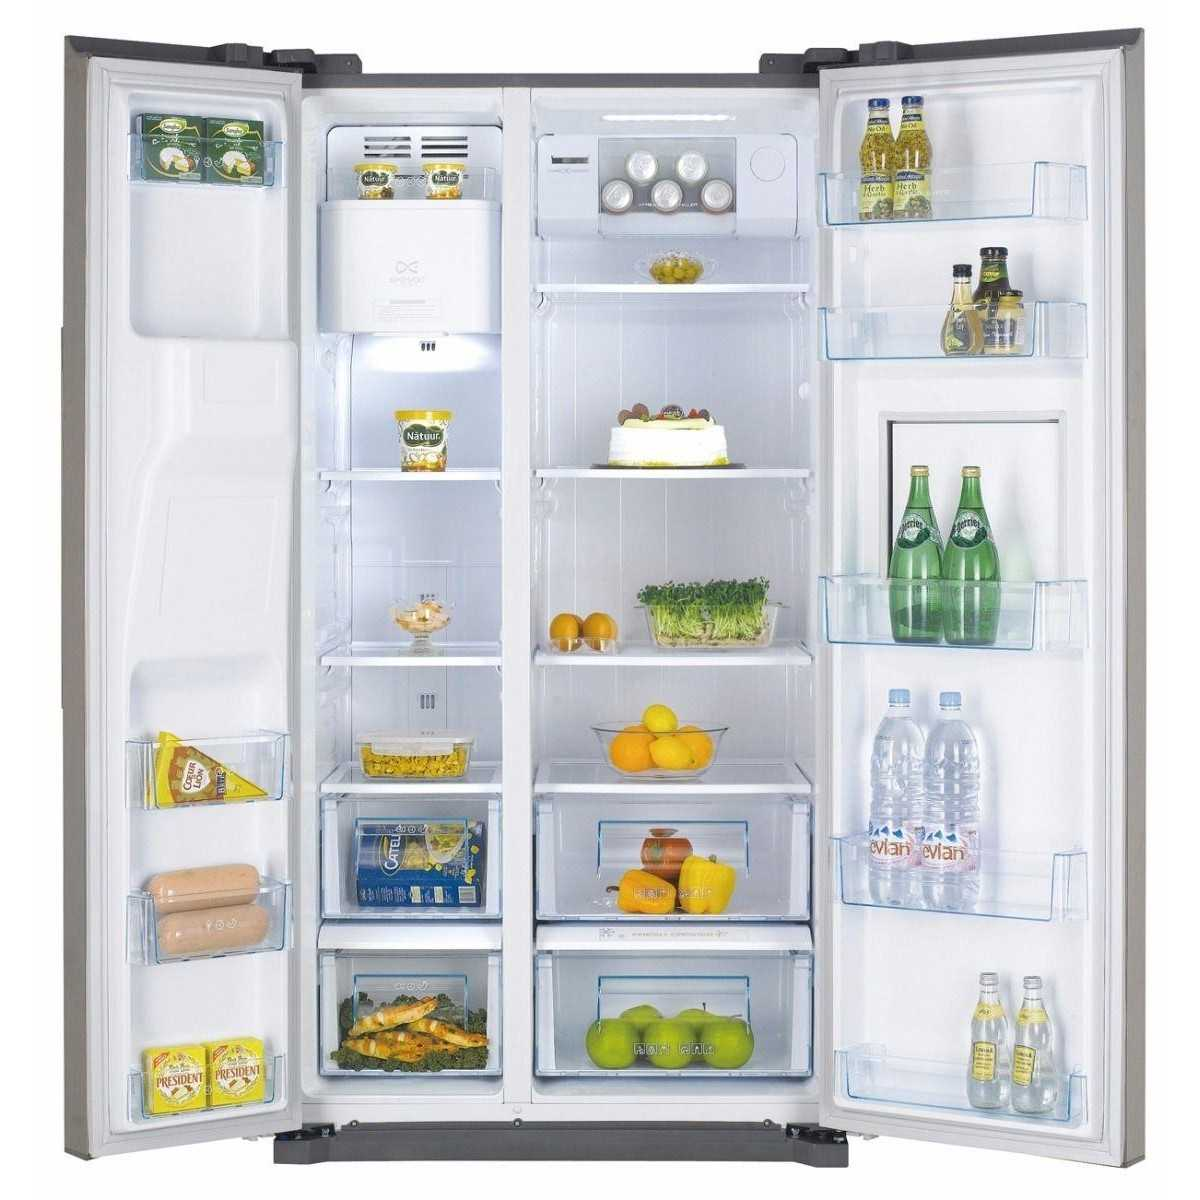 Бытовой холодильник Daewoo FRN-X22B4CW